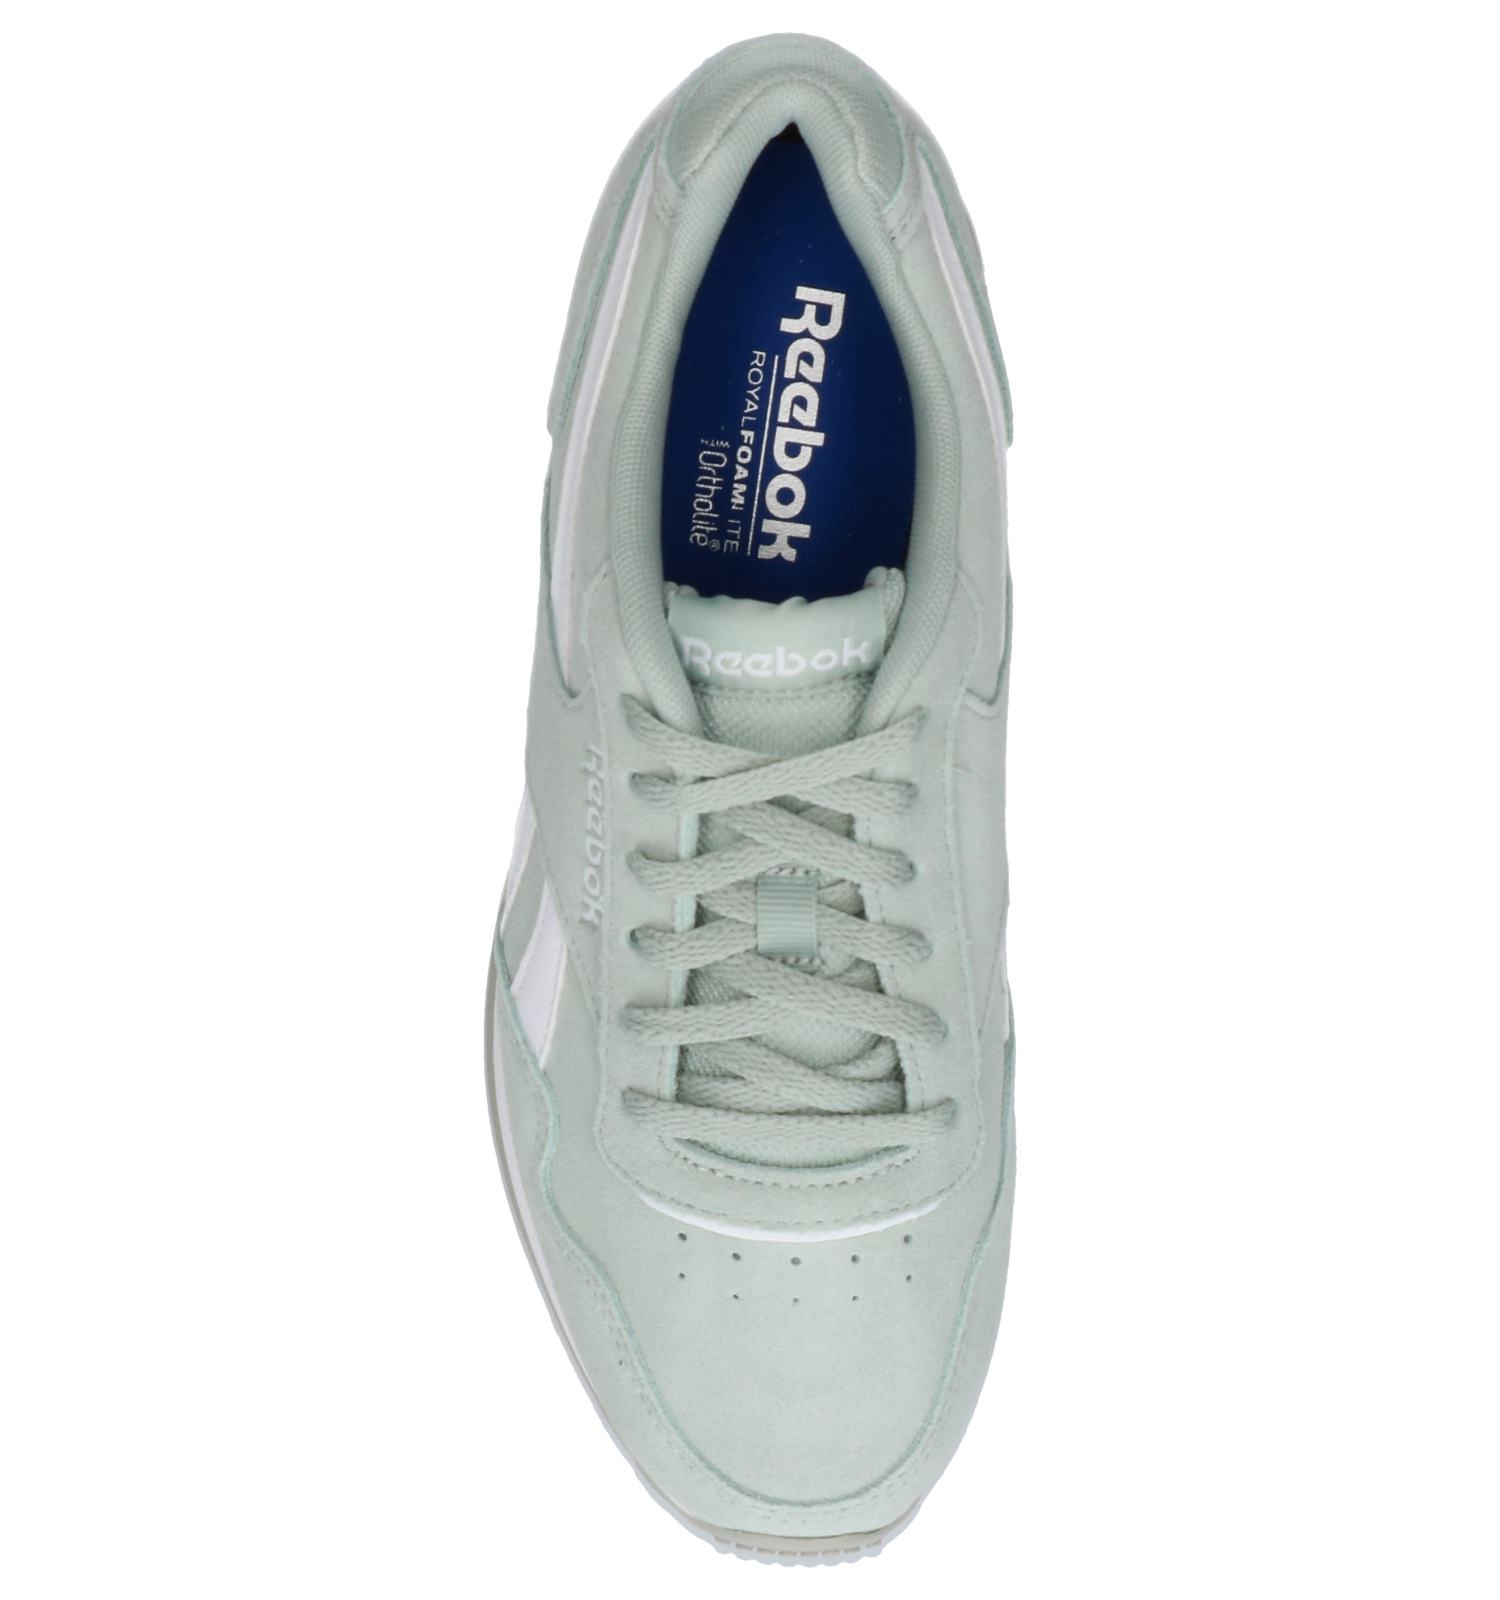 Muntgroene Sneakers Reebok Royal Glide | SCHOENENTORFS.NL | Gratis verzend en retour